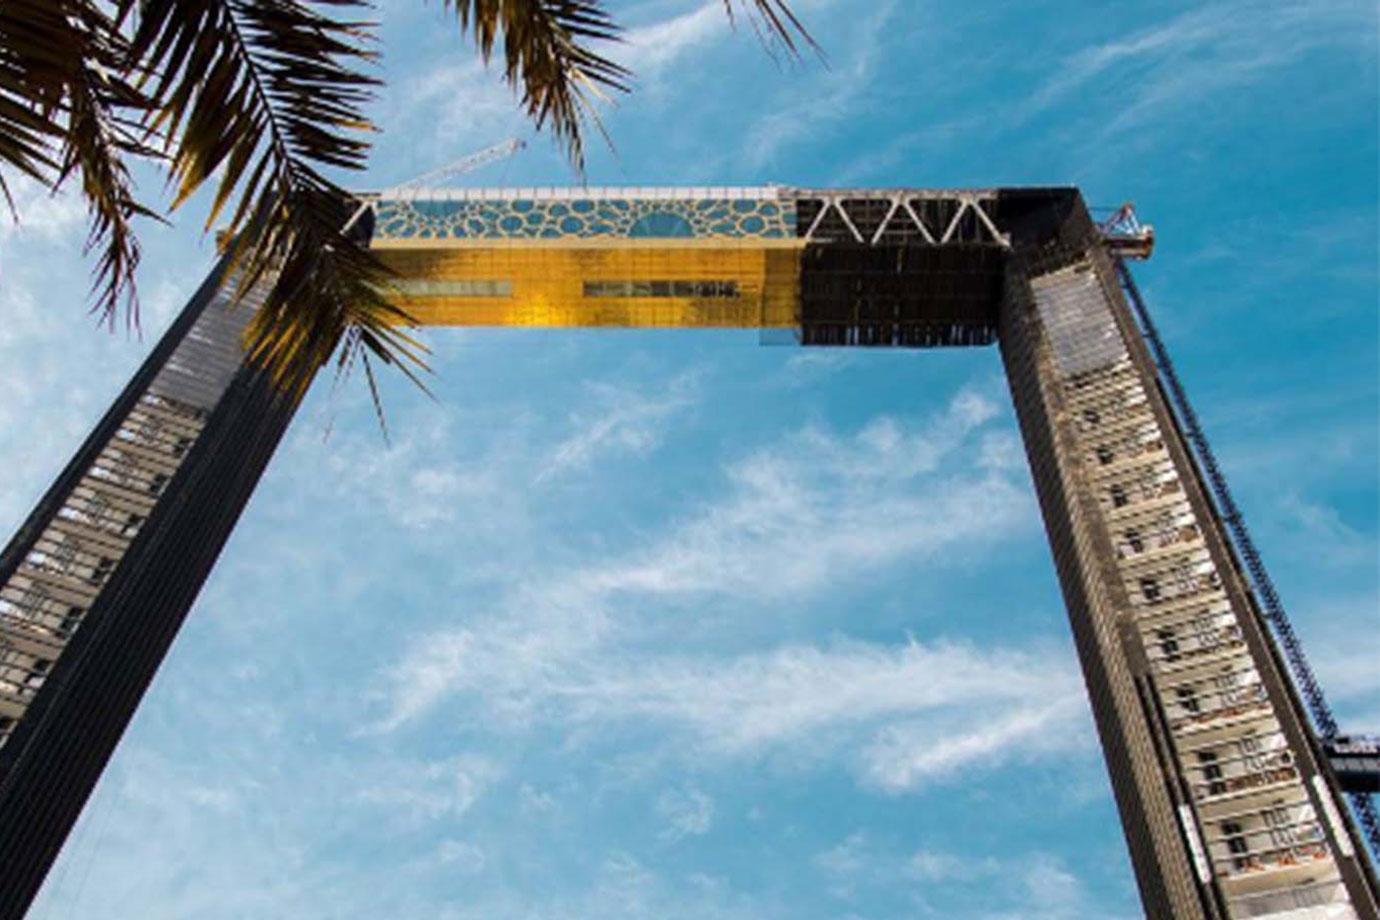 Dubai's newest landmark shines in gold